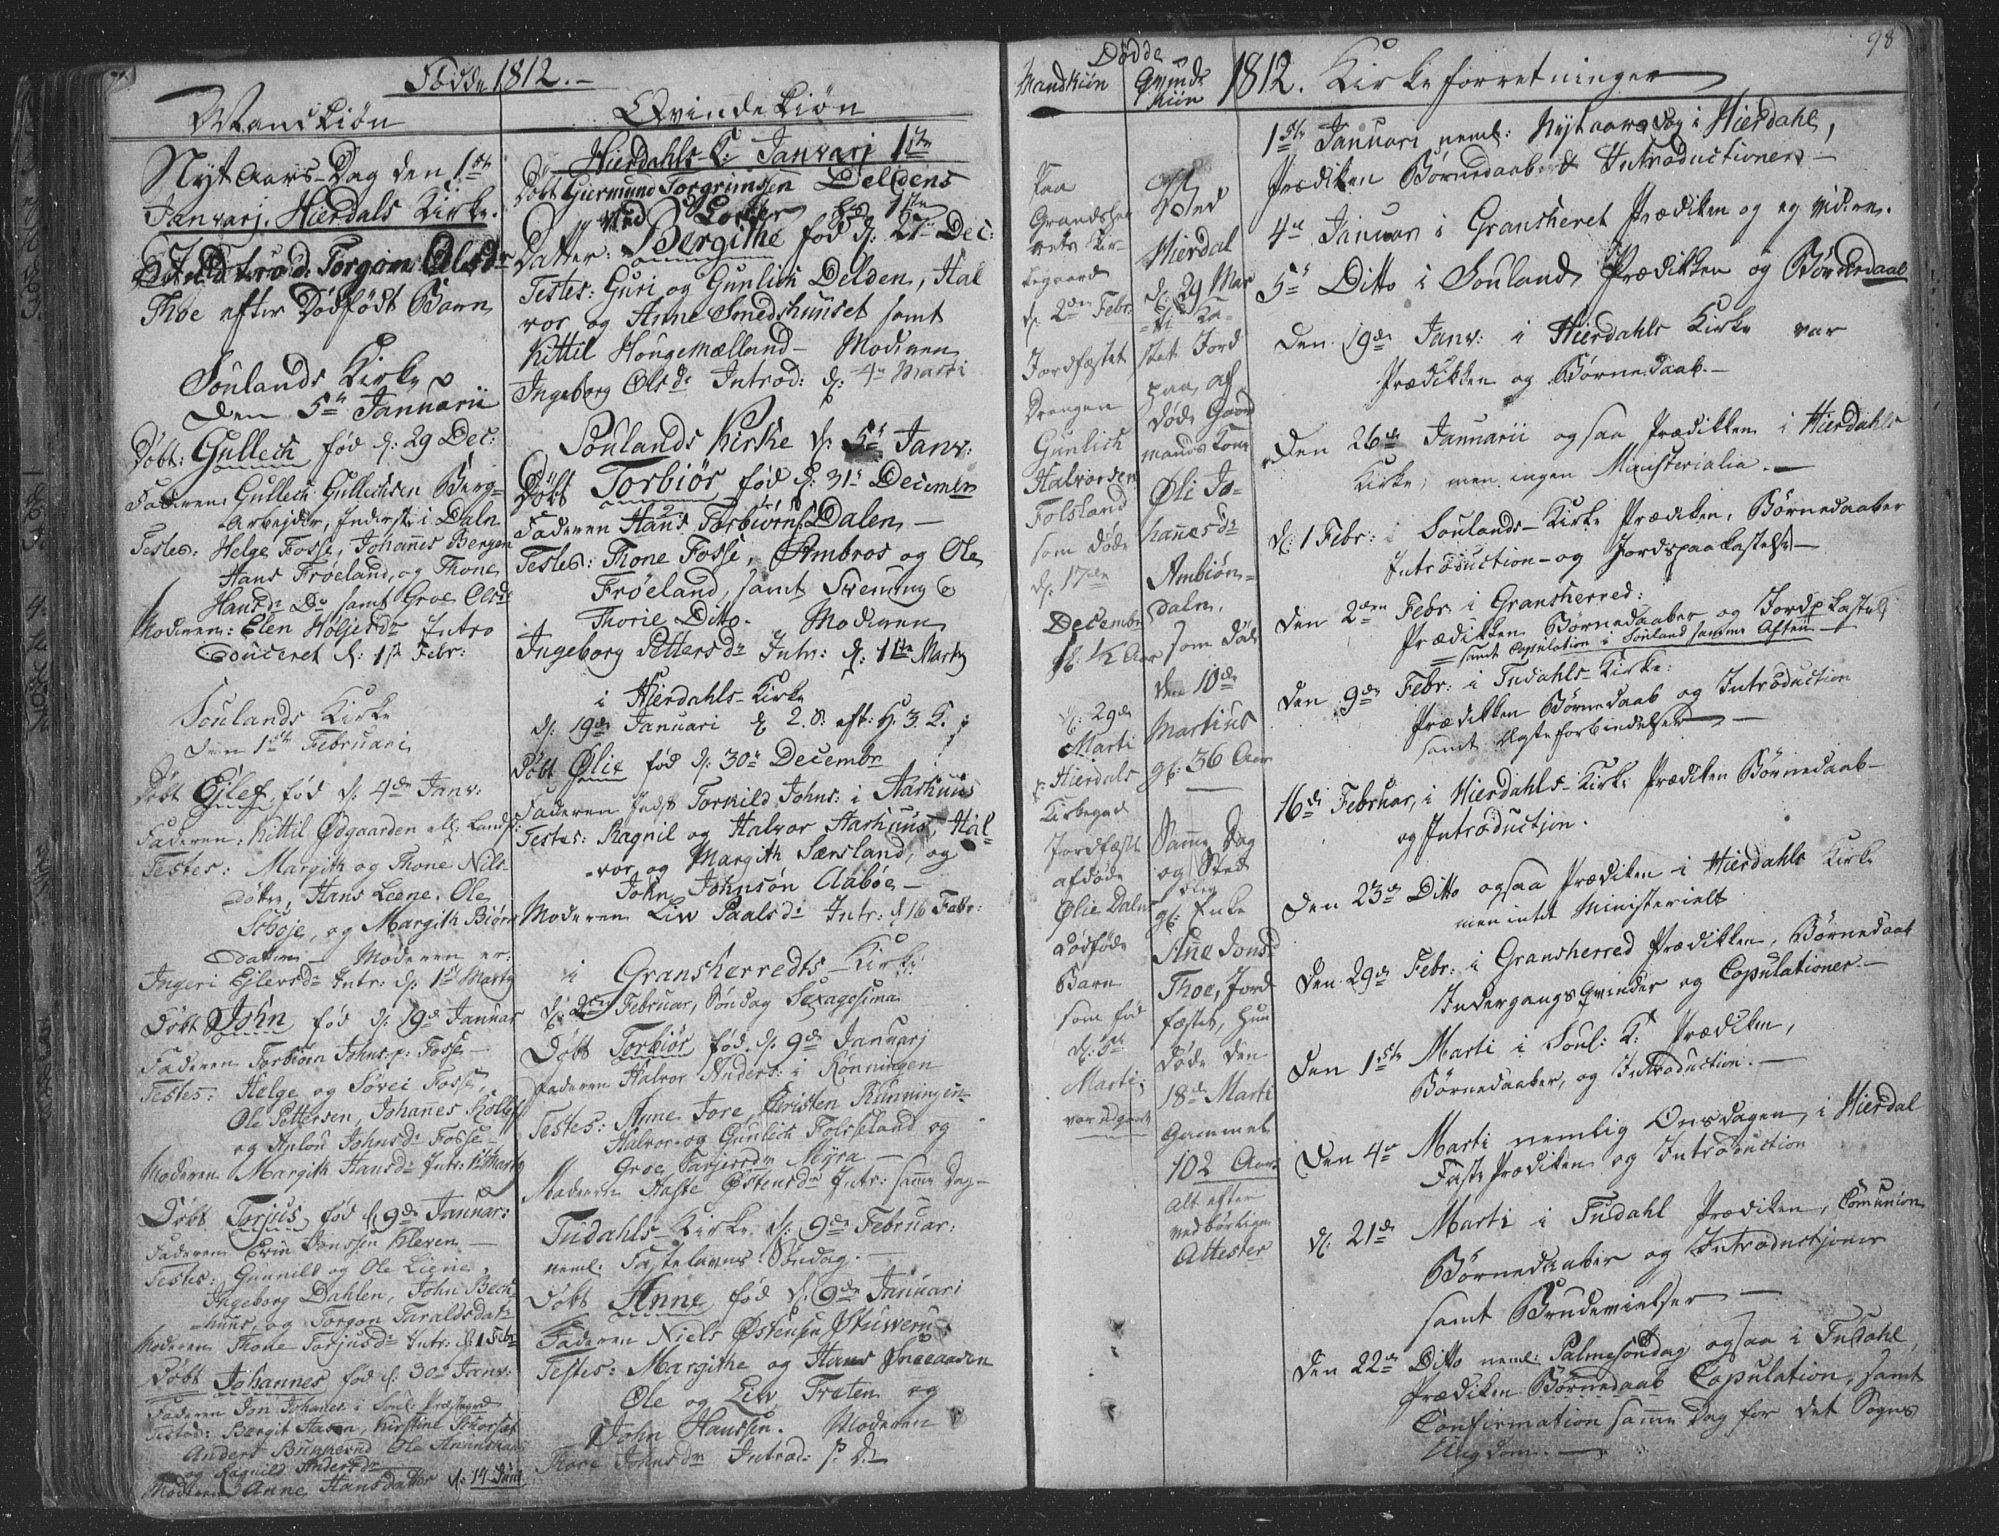 SAKO, Hjartdal kirkebøker, F/Fa/L0006: Ministerialbok nr. I 6, 1801-1814, s. 98